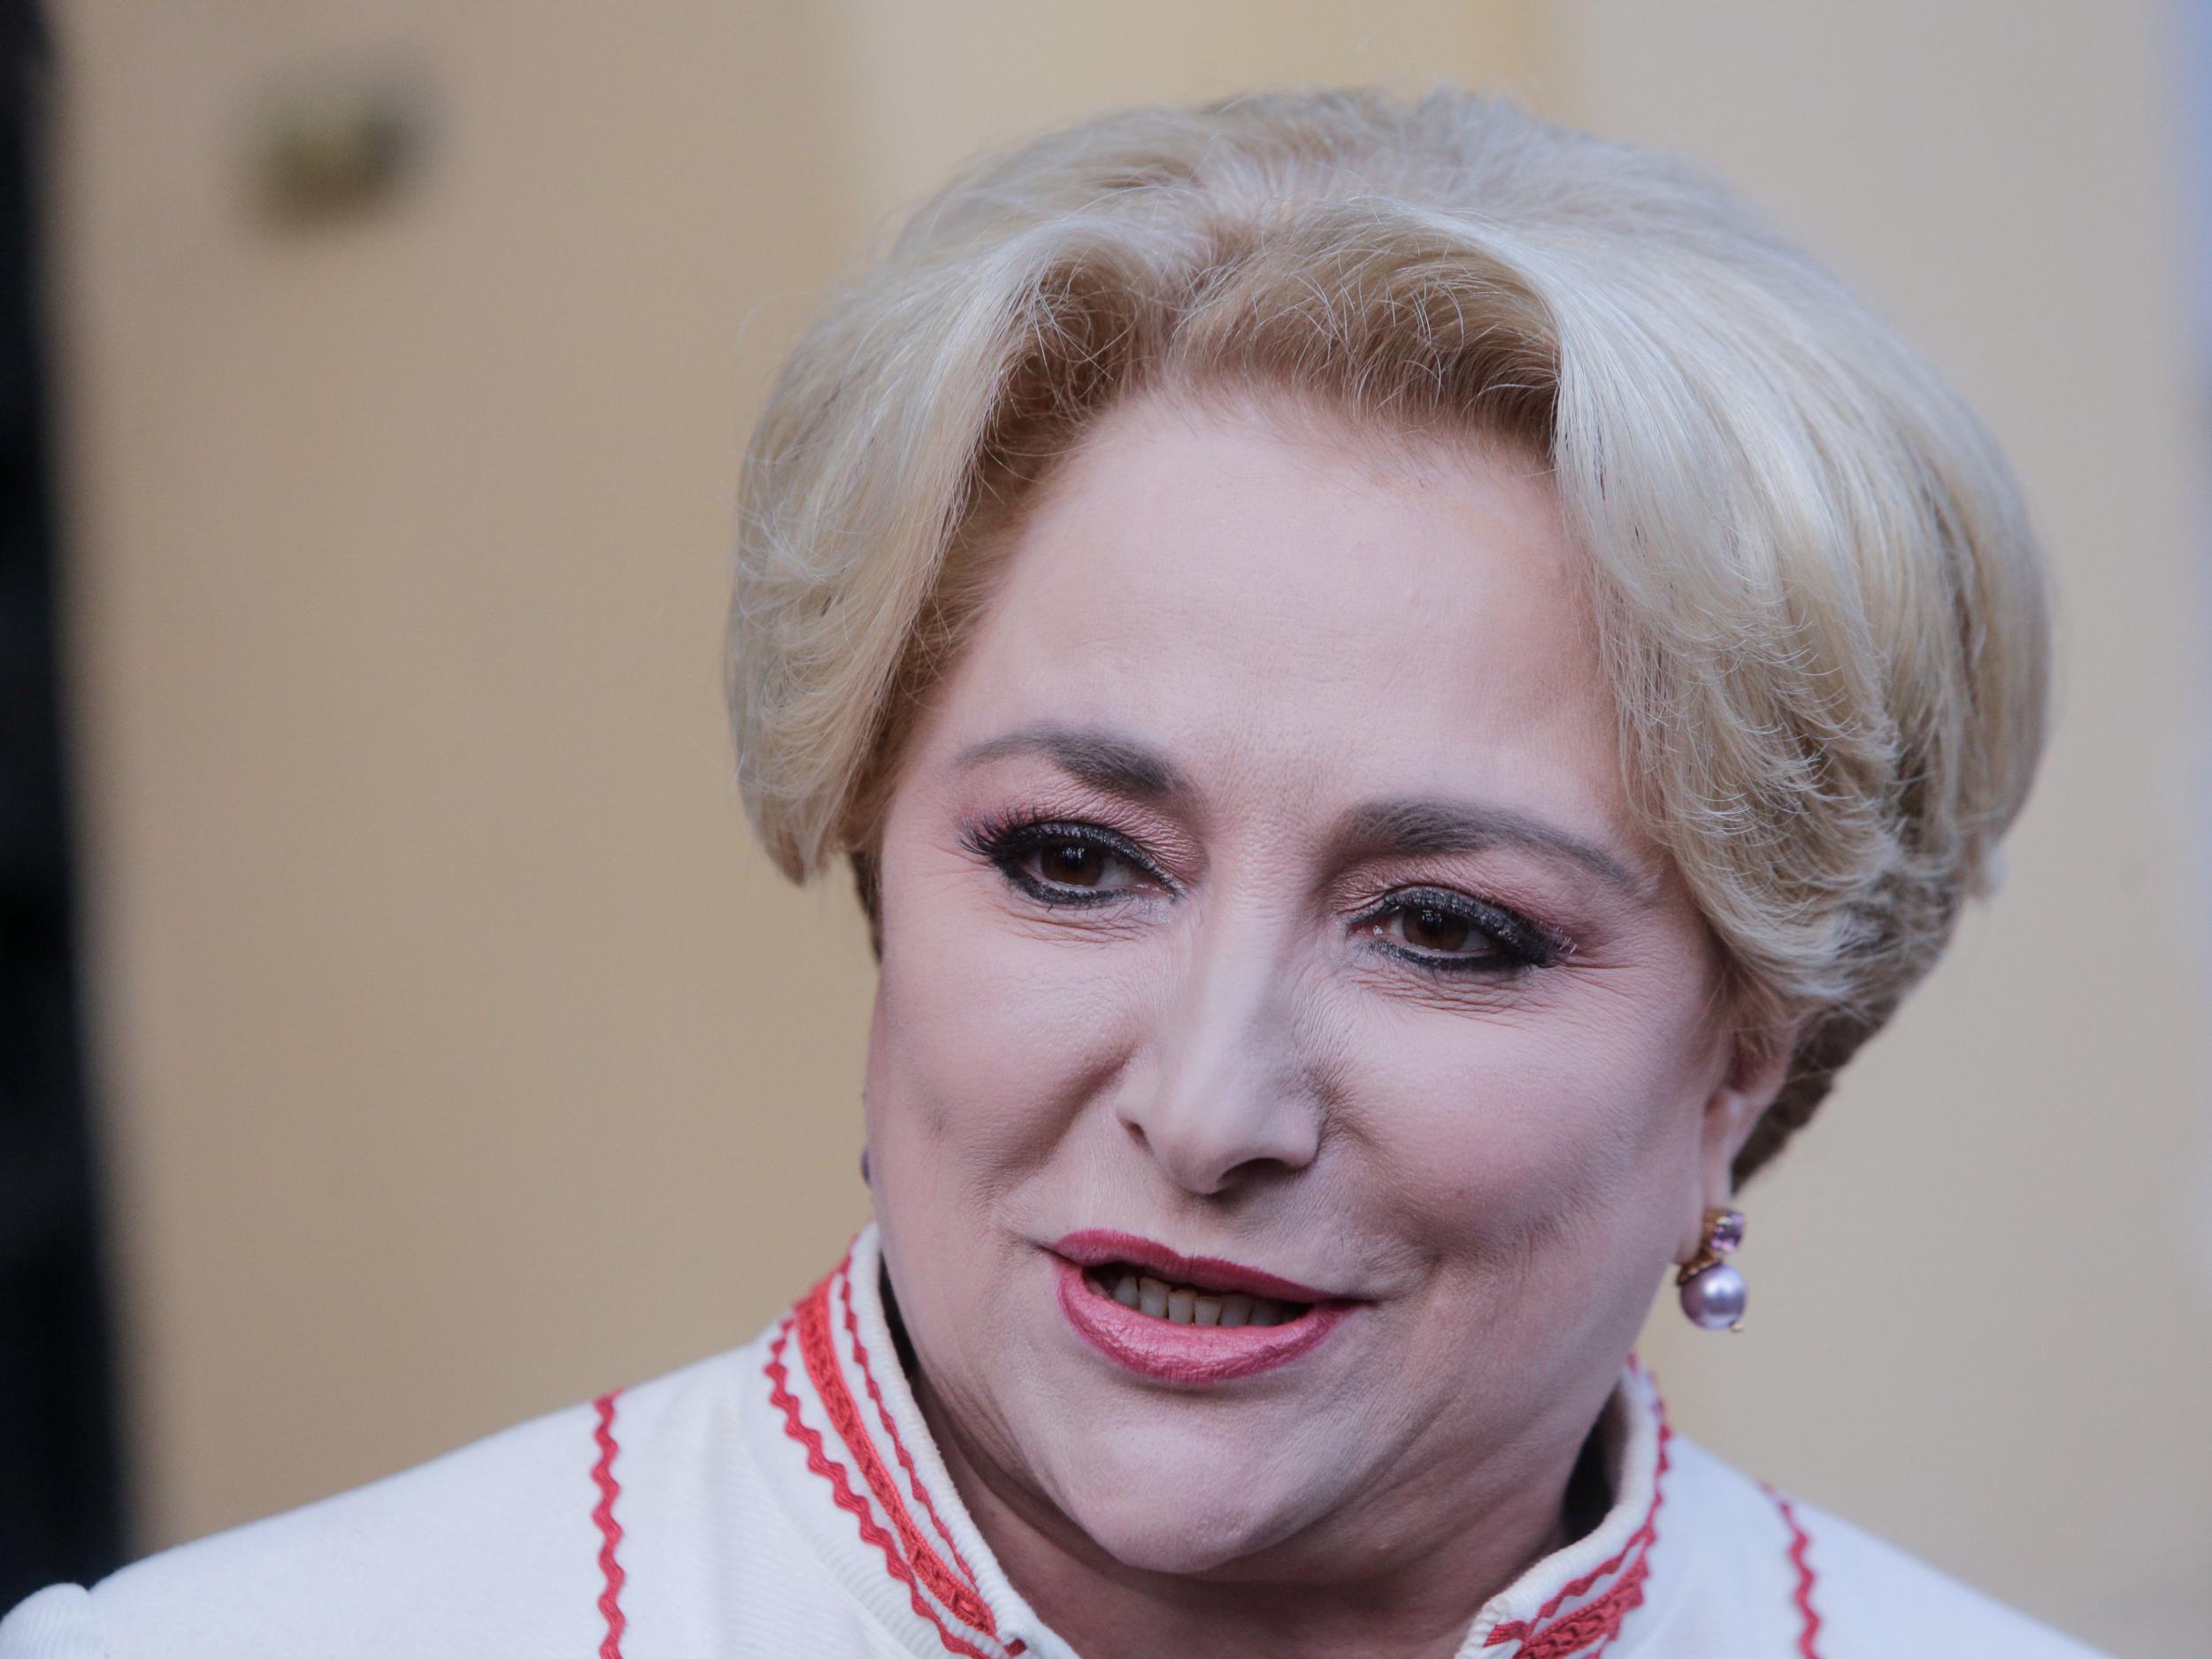 Viorica Dancila nominated as Romania's first female Prime Minister